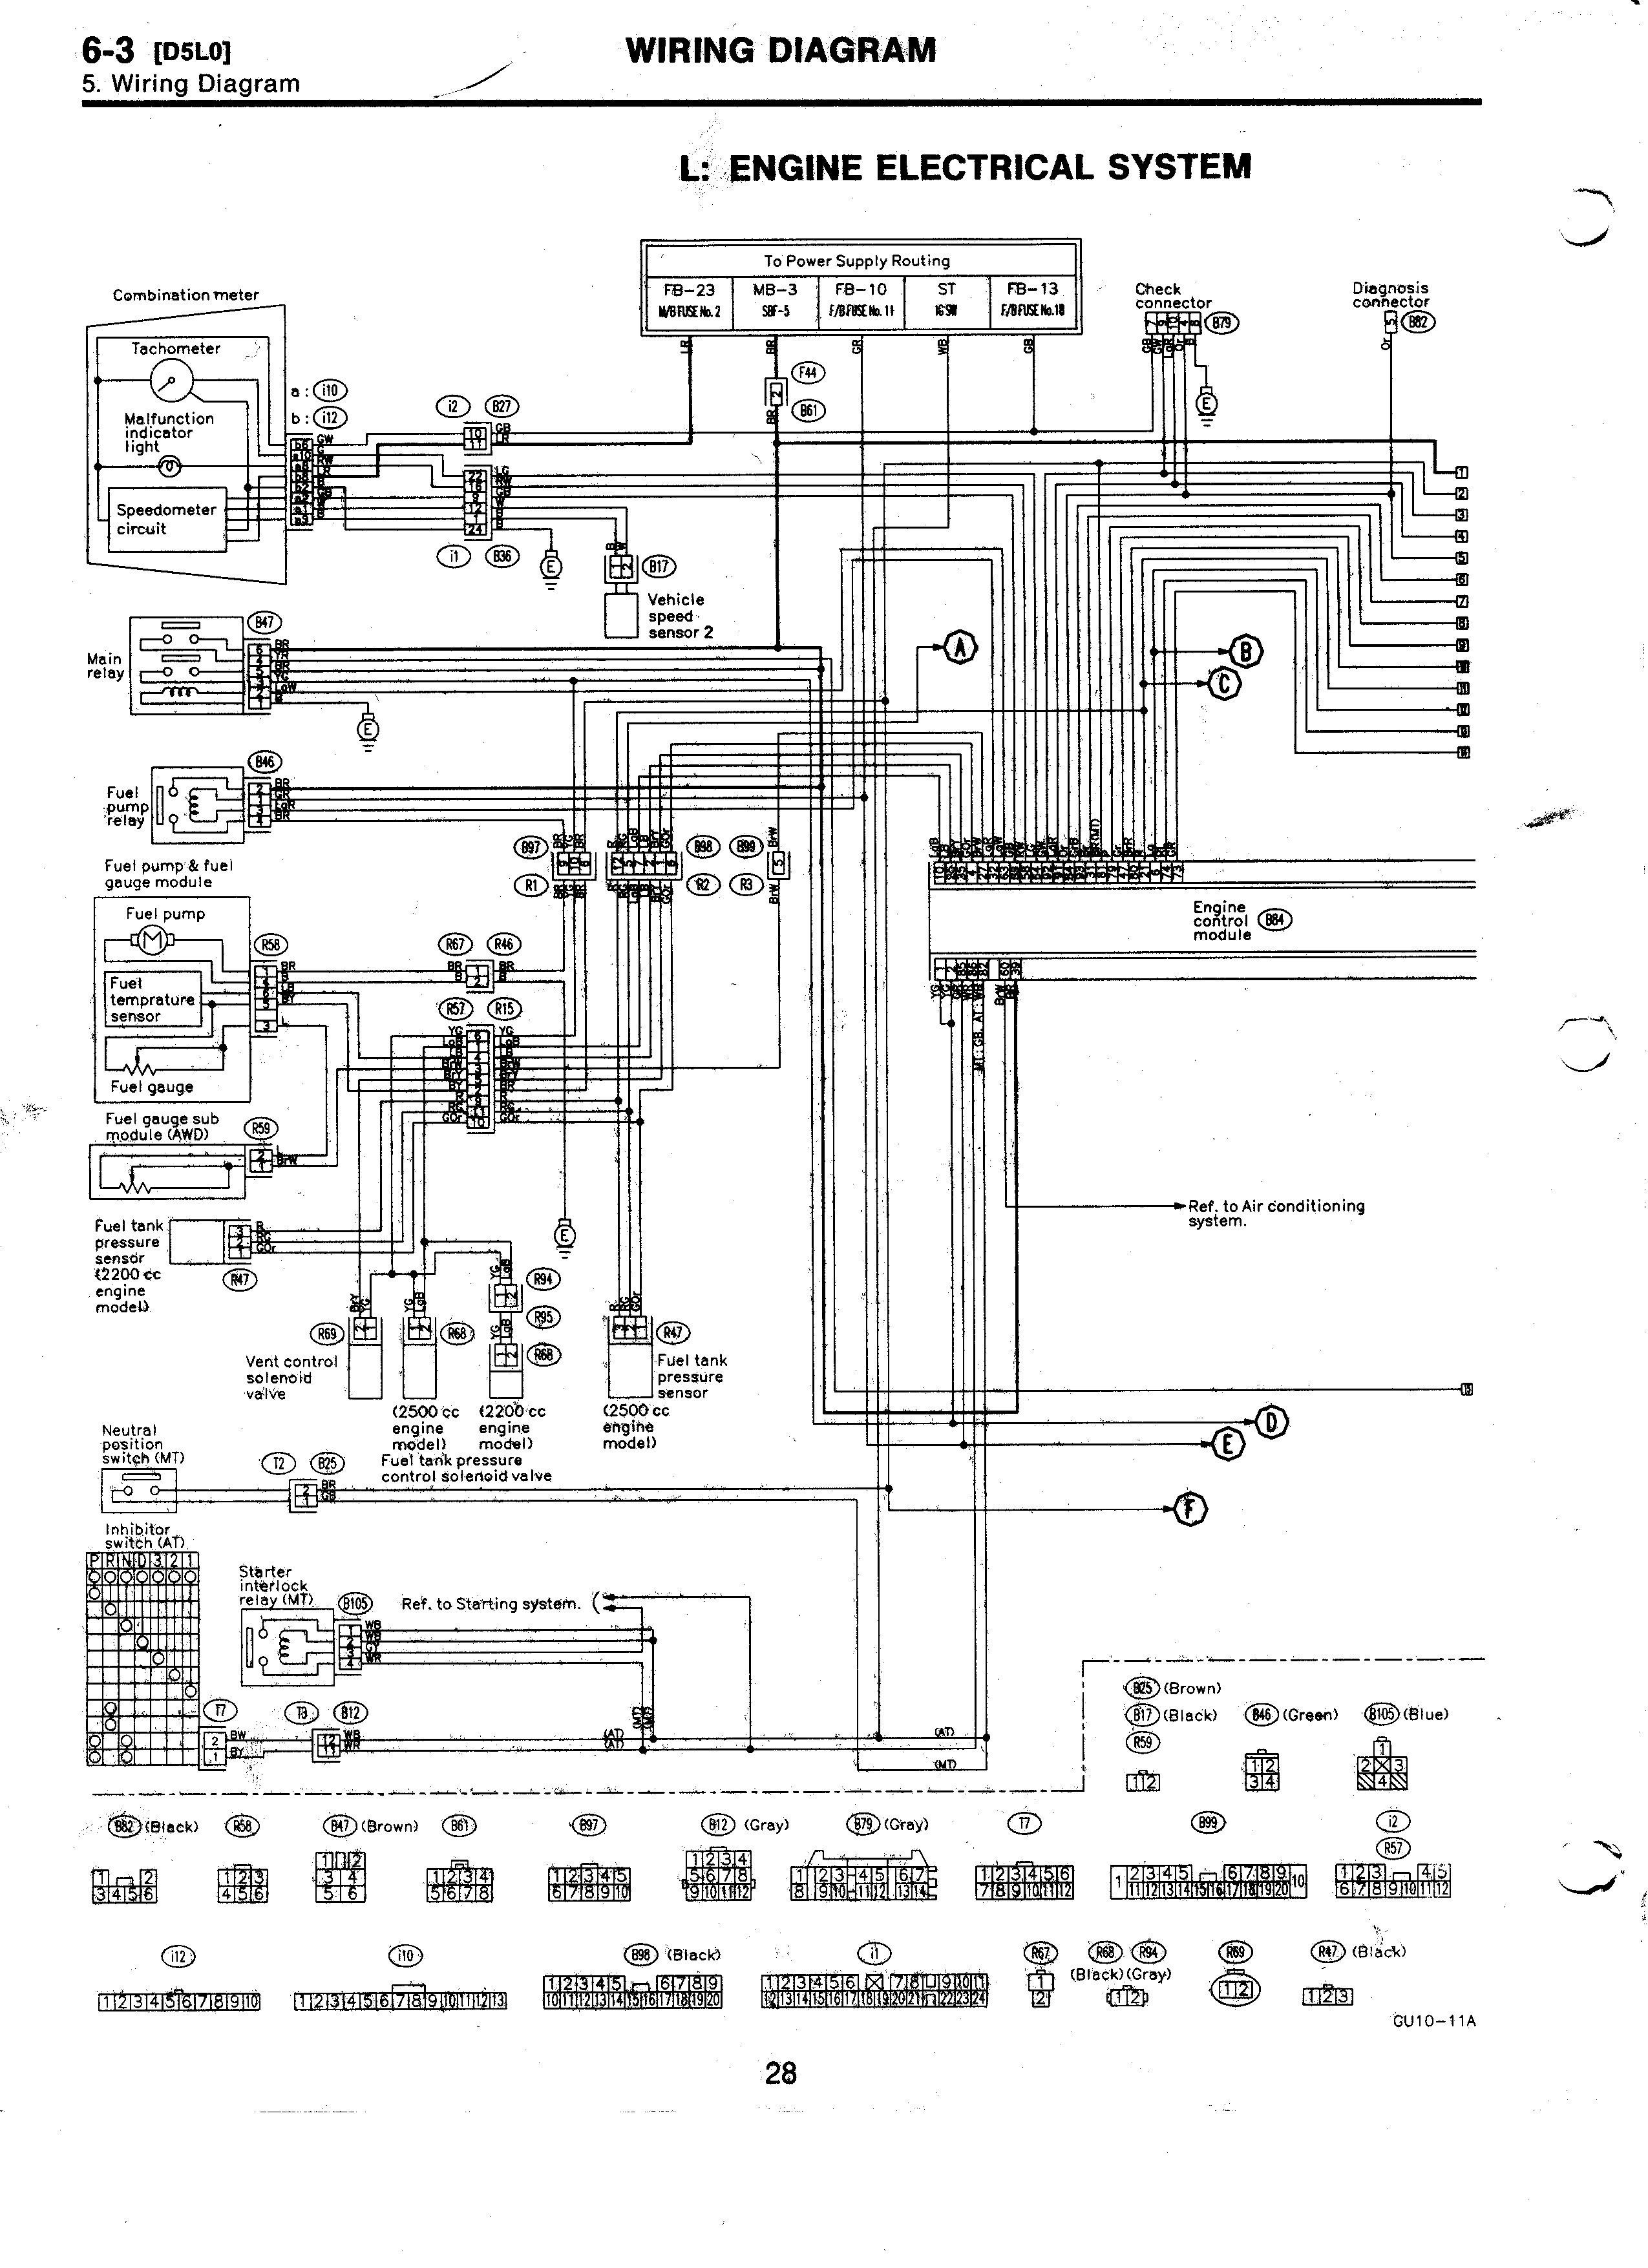 2002 Subaru Wrx Engine Diagram Freightliner Engine Diagram 2002 Automotive Wiring Diagrams Of 2002 Subaru Wrx Engine Diagram